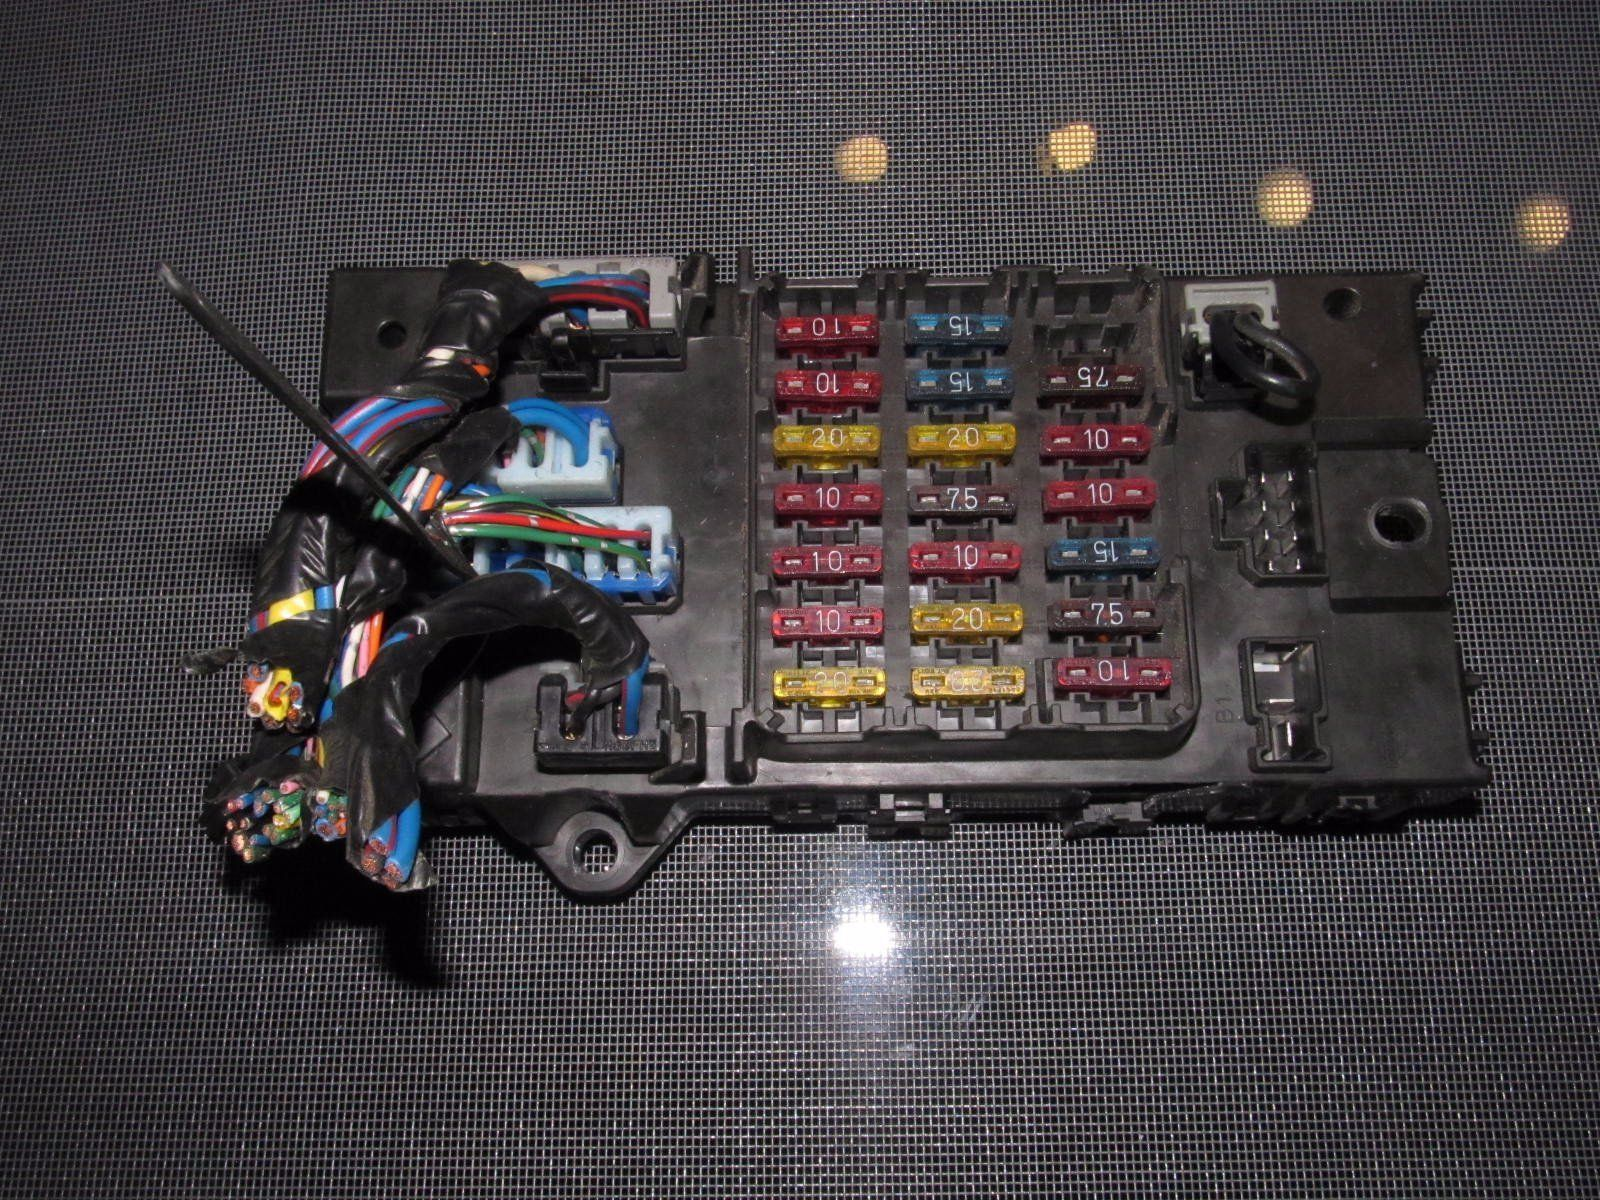 1990 Nissan 300zx Fuse Box Location Trusted Wiring Diagrams 1987 Pathfinder Nemetas Aufgegabelt Info 2002